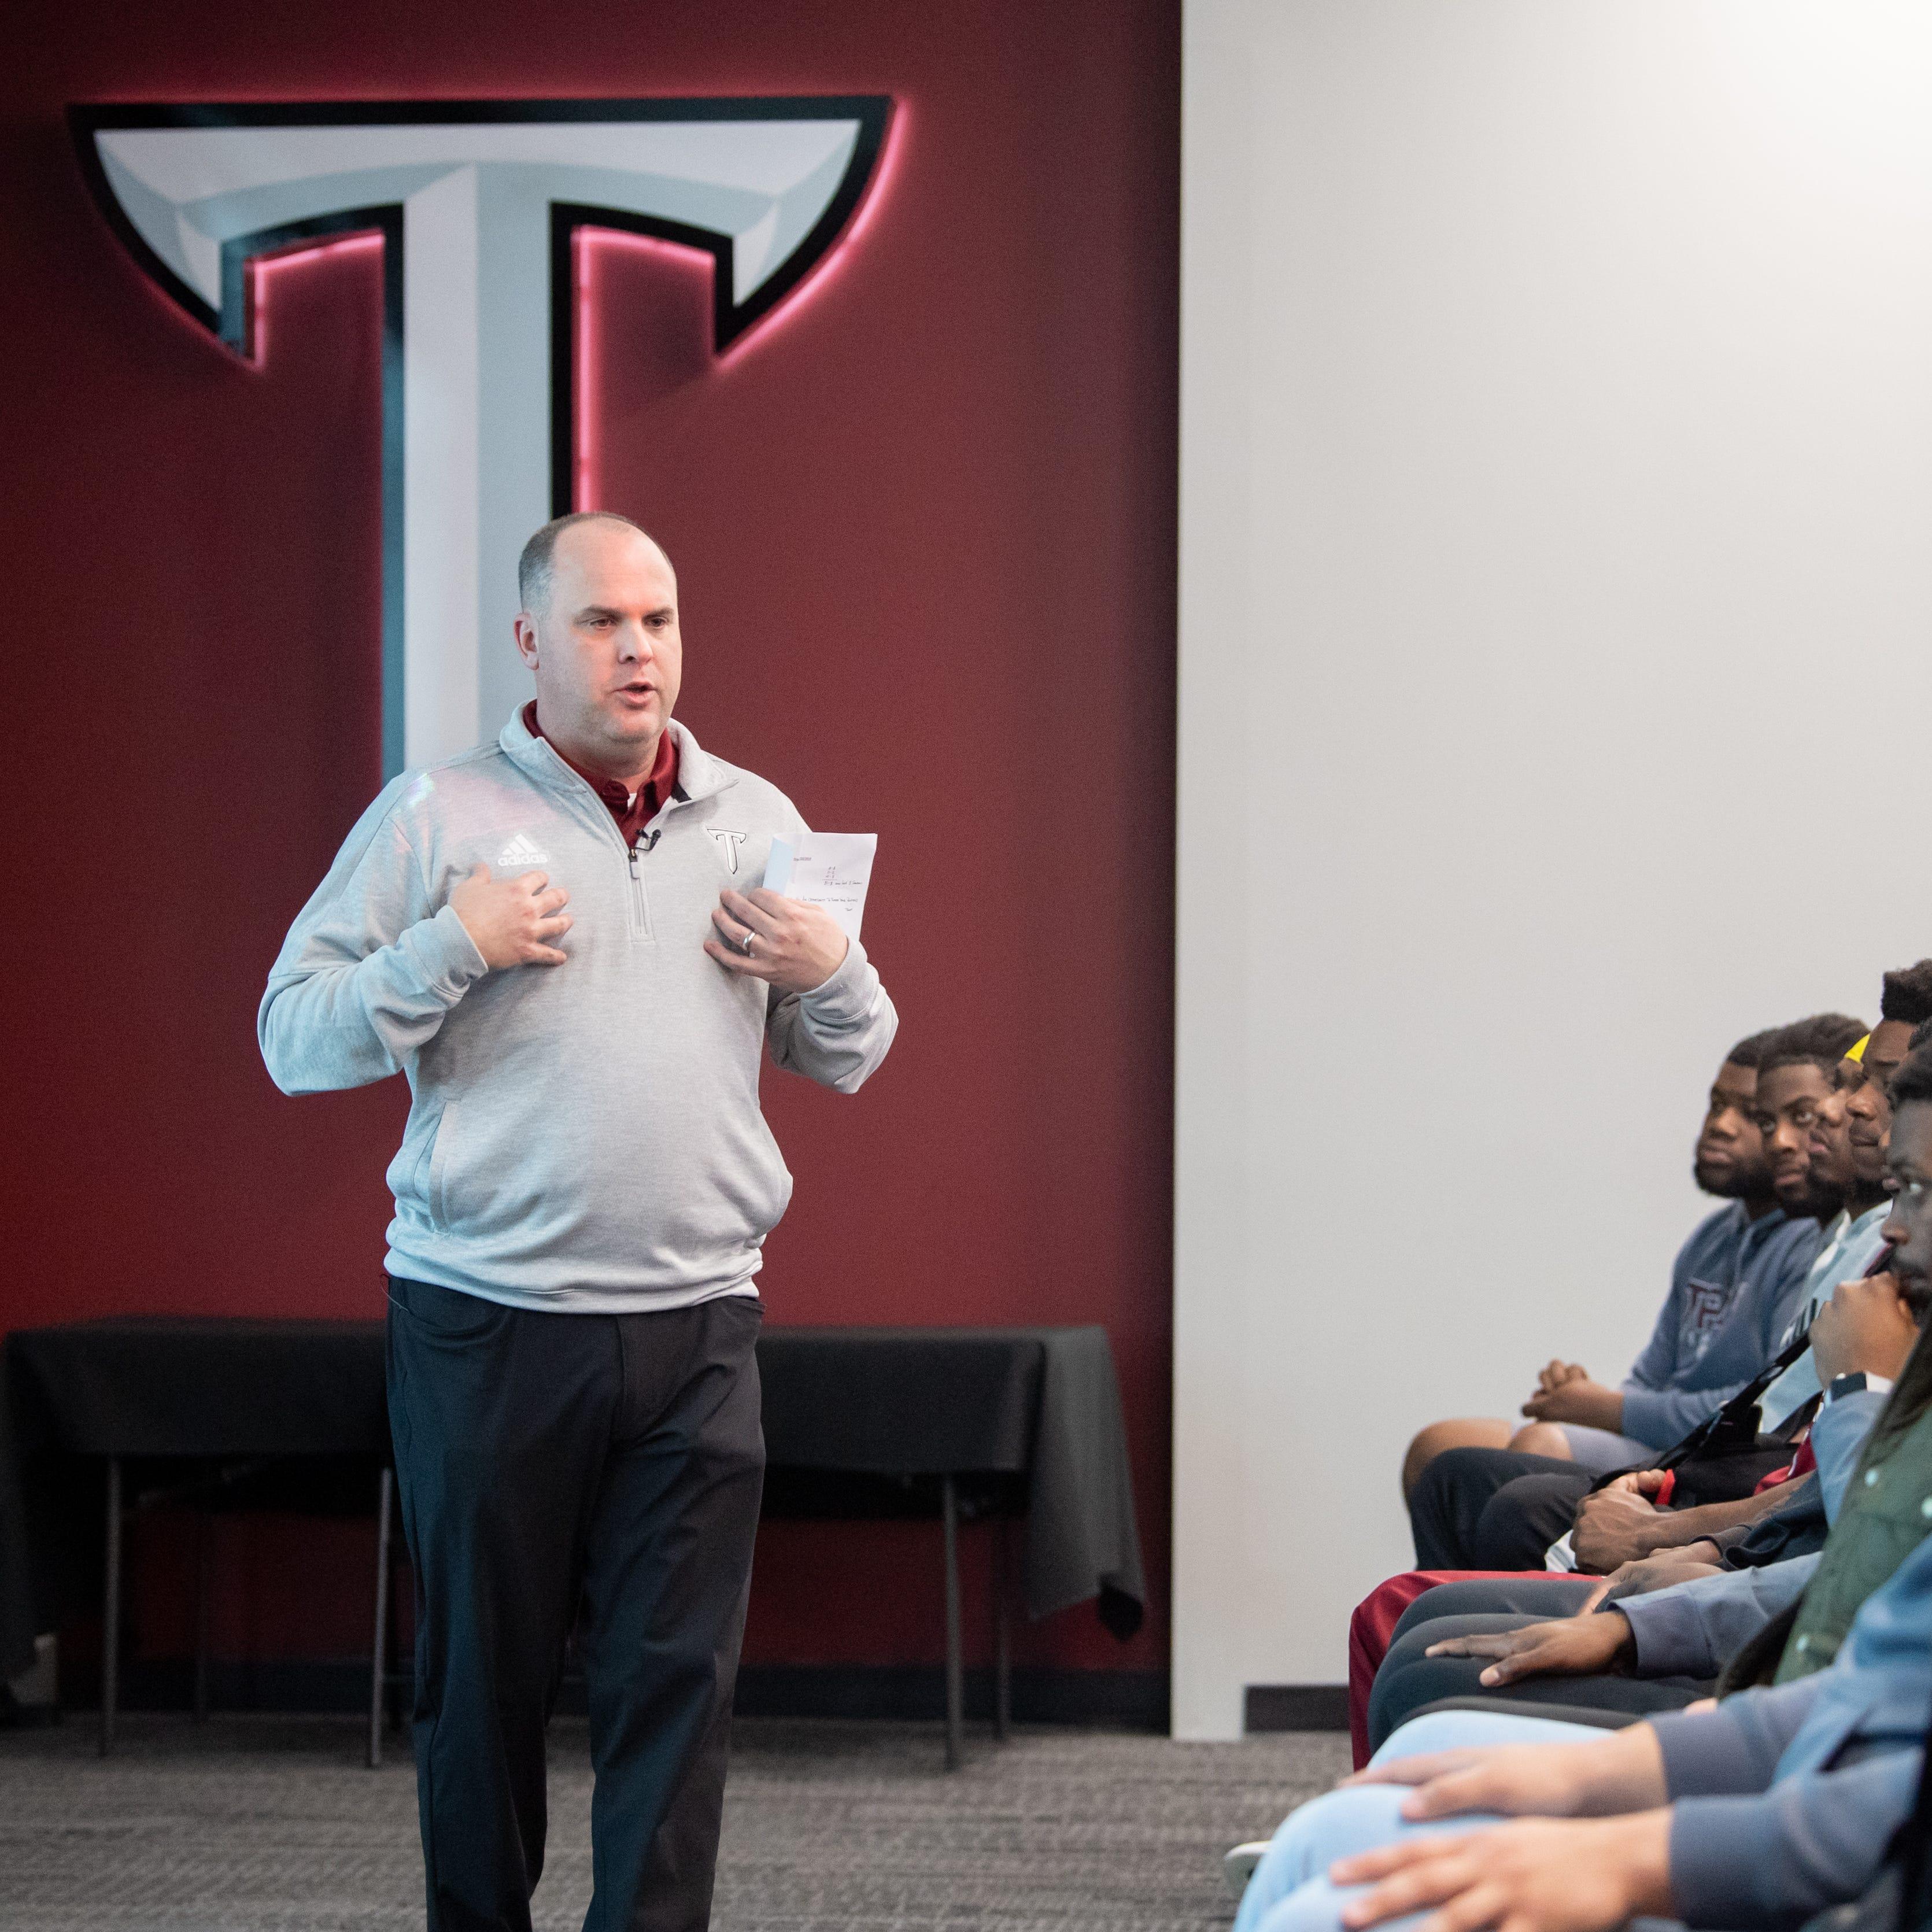 Chip Lindsey makes quick impression on Troy Trojans